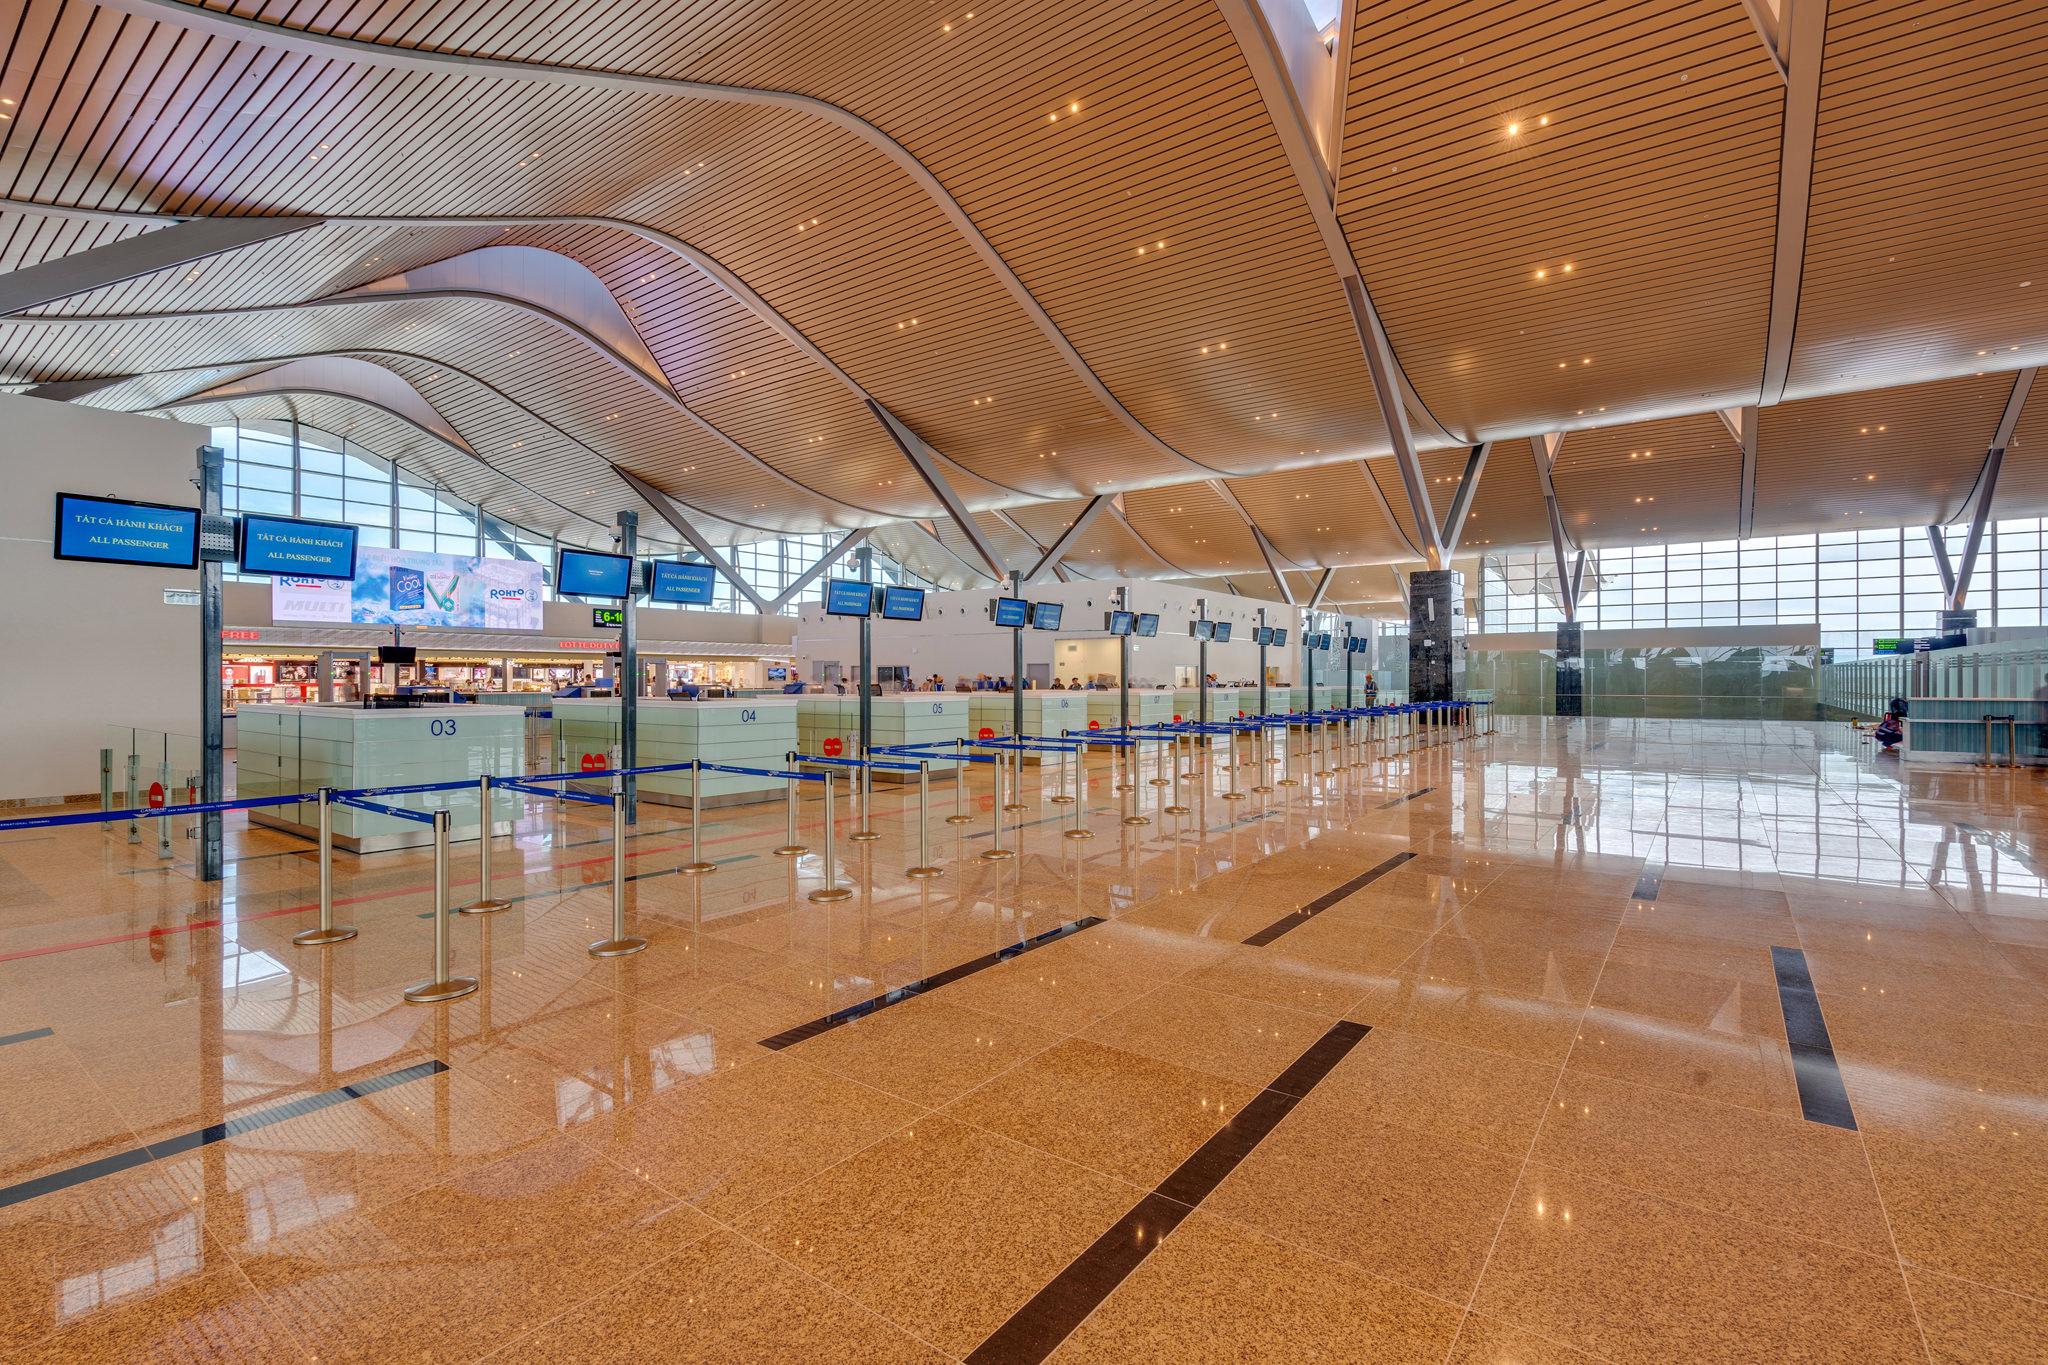 20180626 - Cam Ranh Airport - Architecture - 0329.jpg